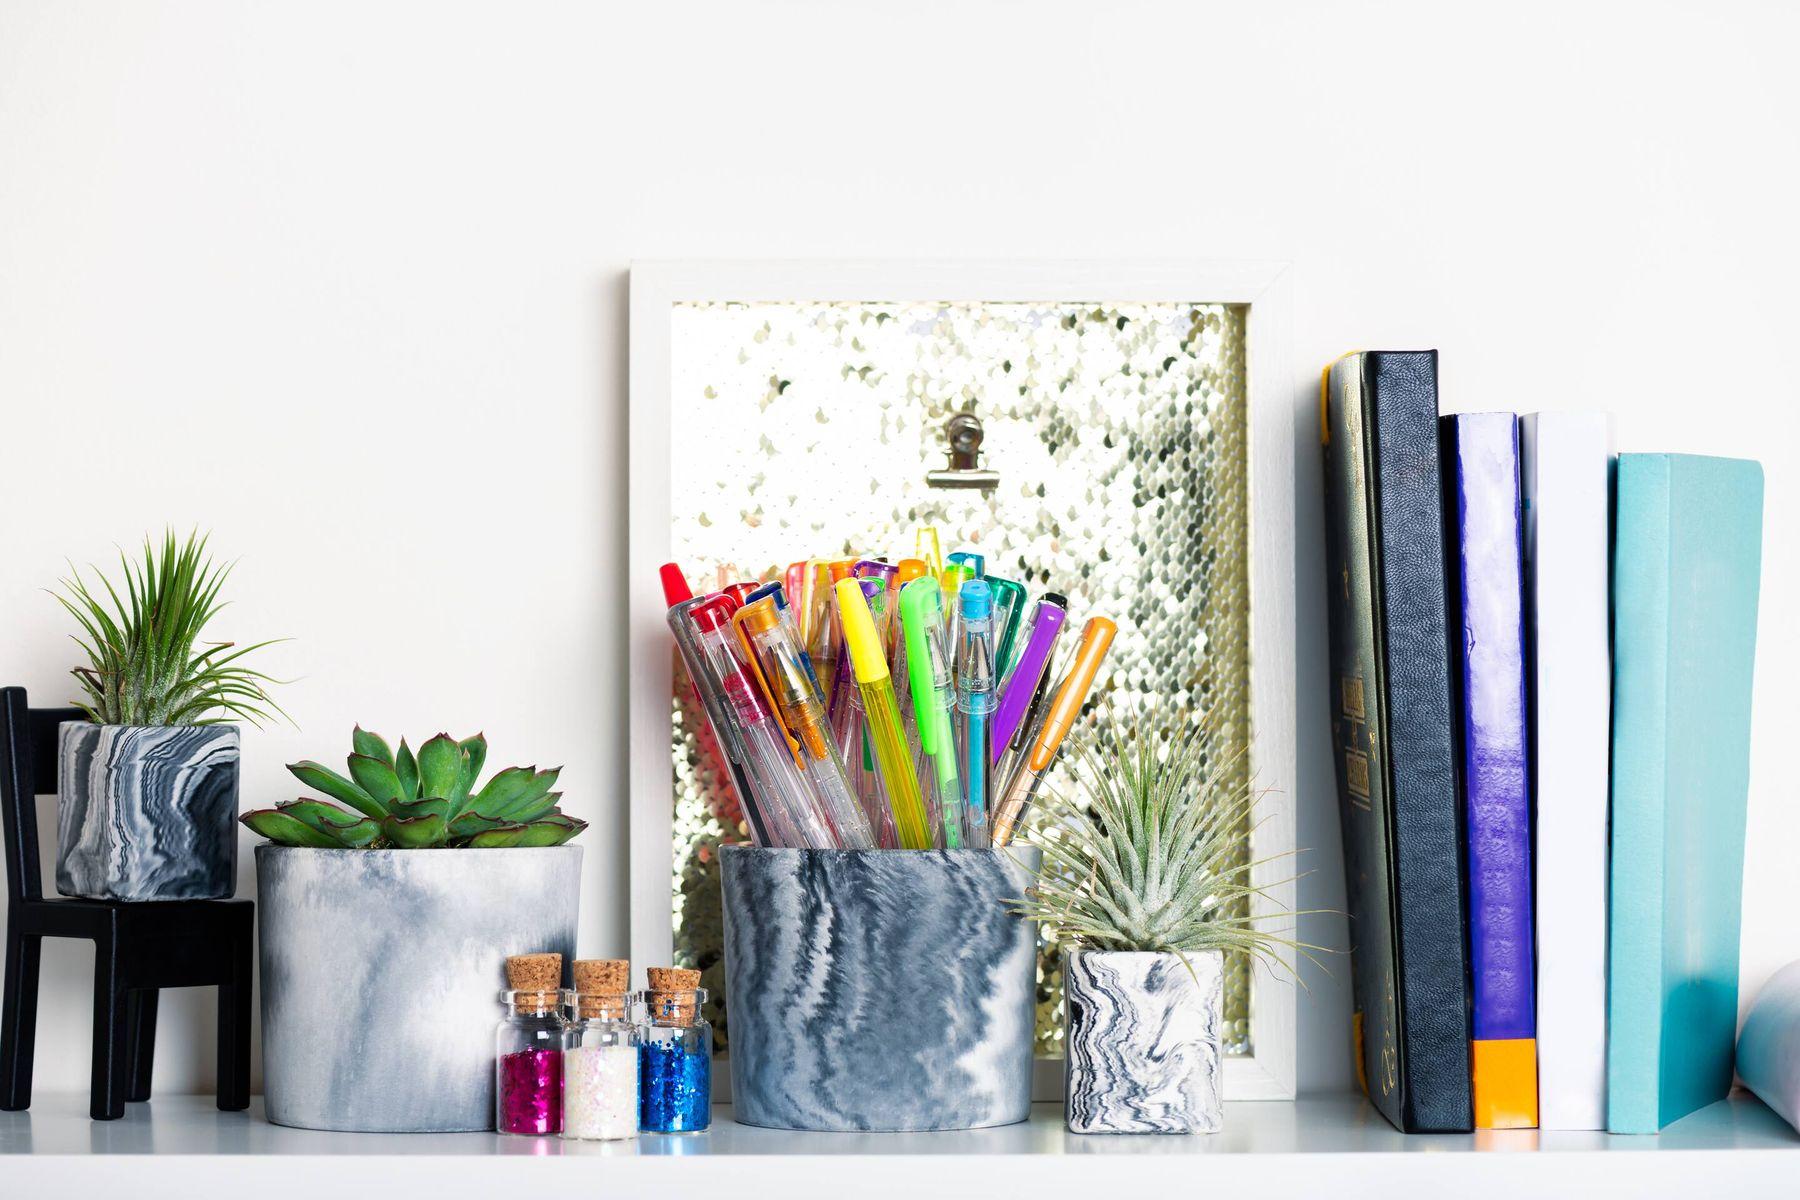 How to Restore Marble showpieces original colour?